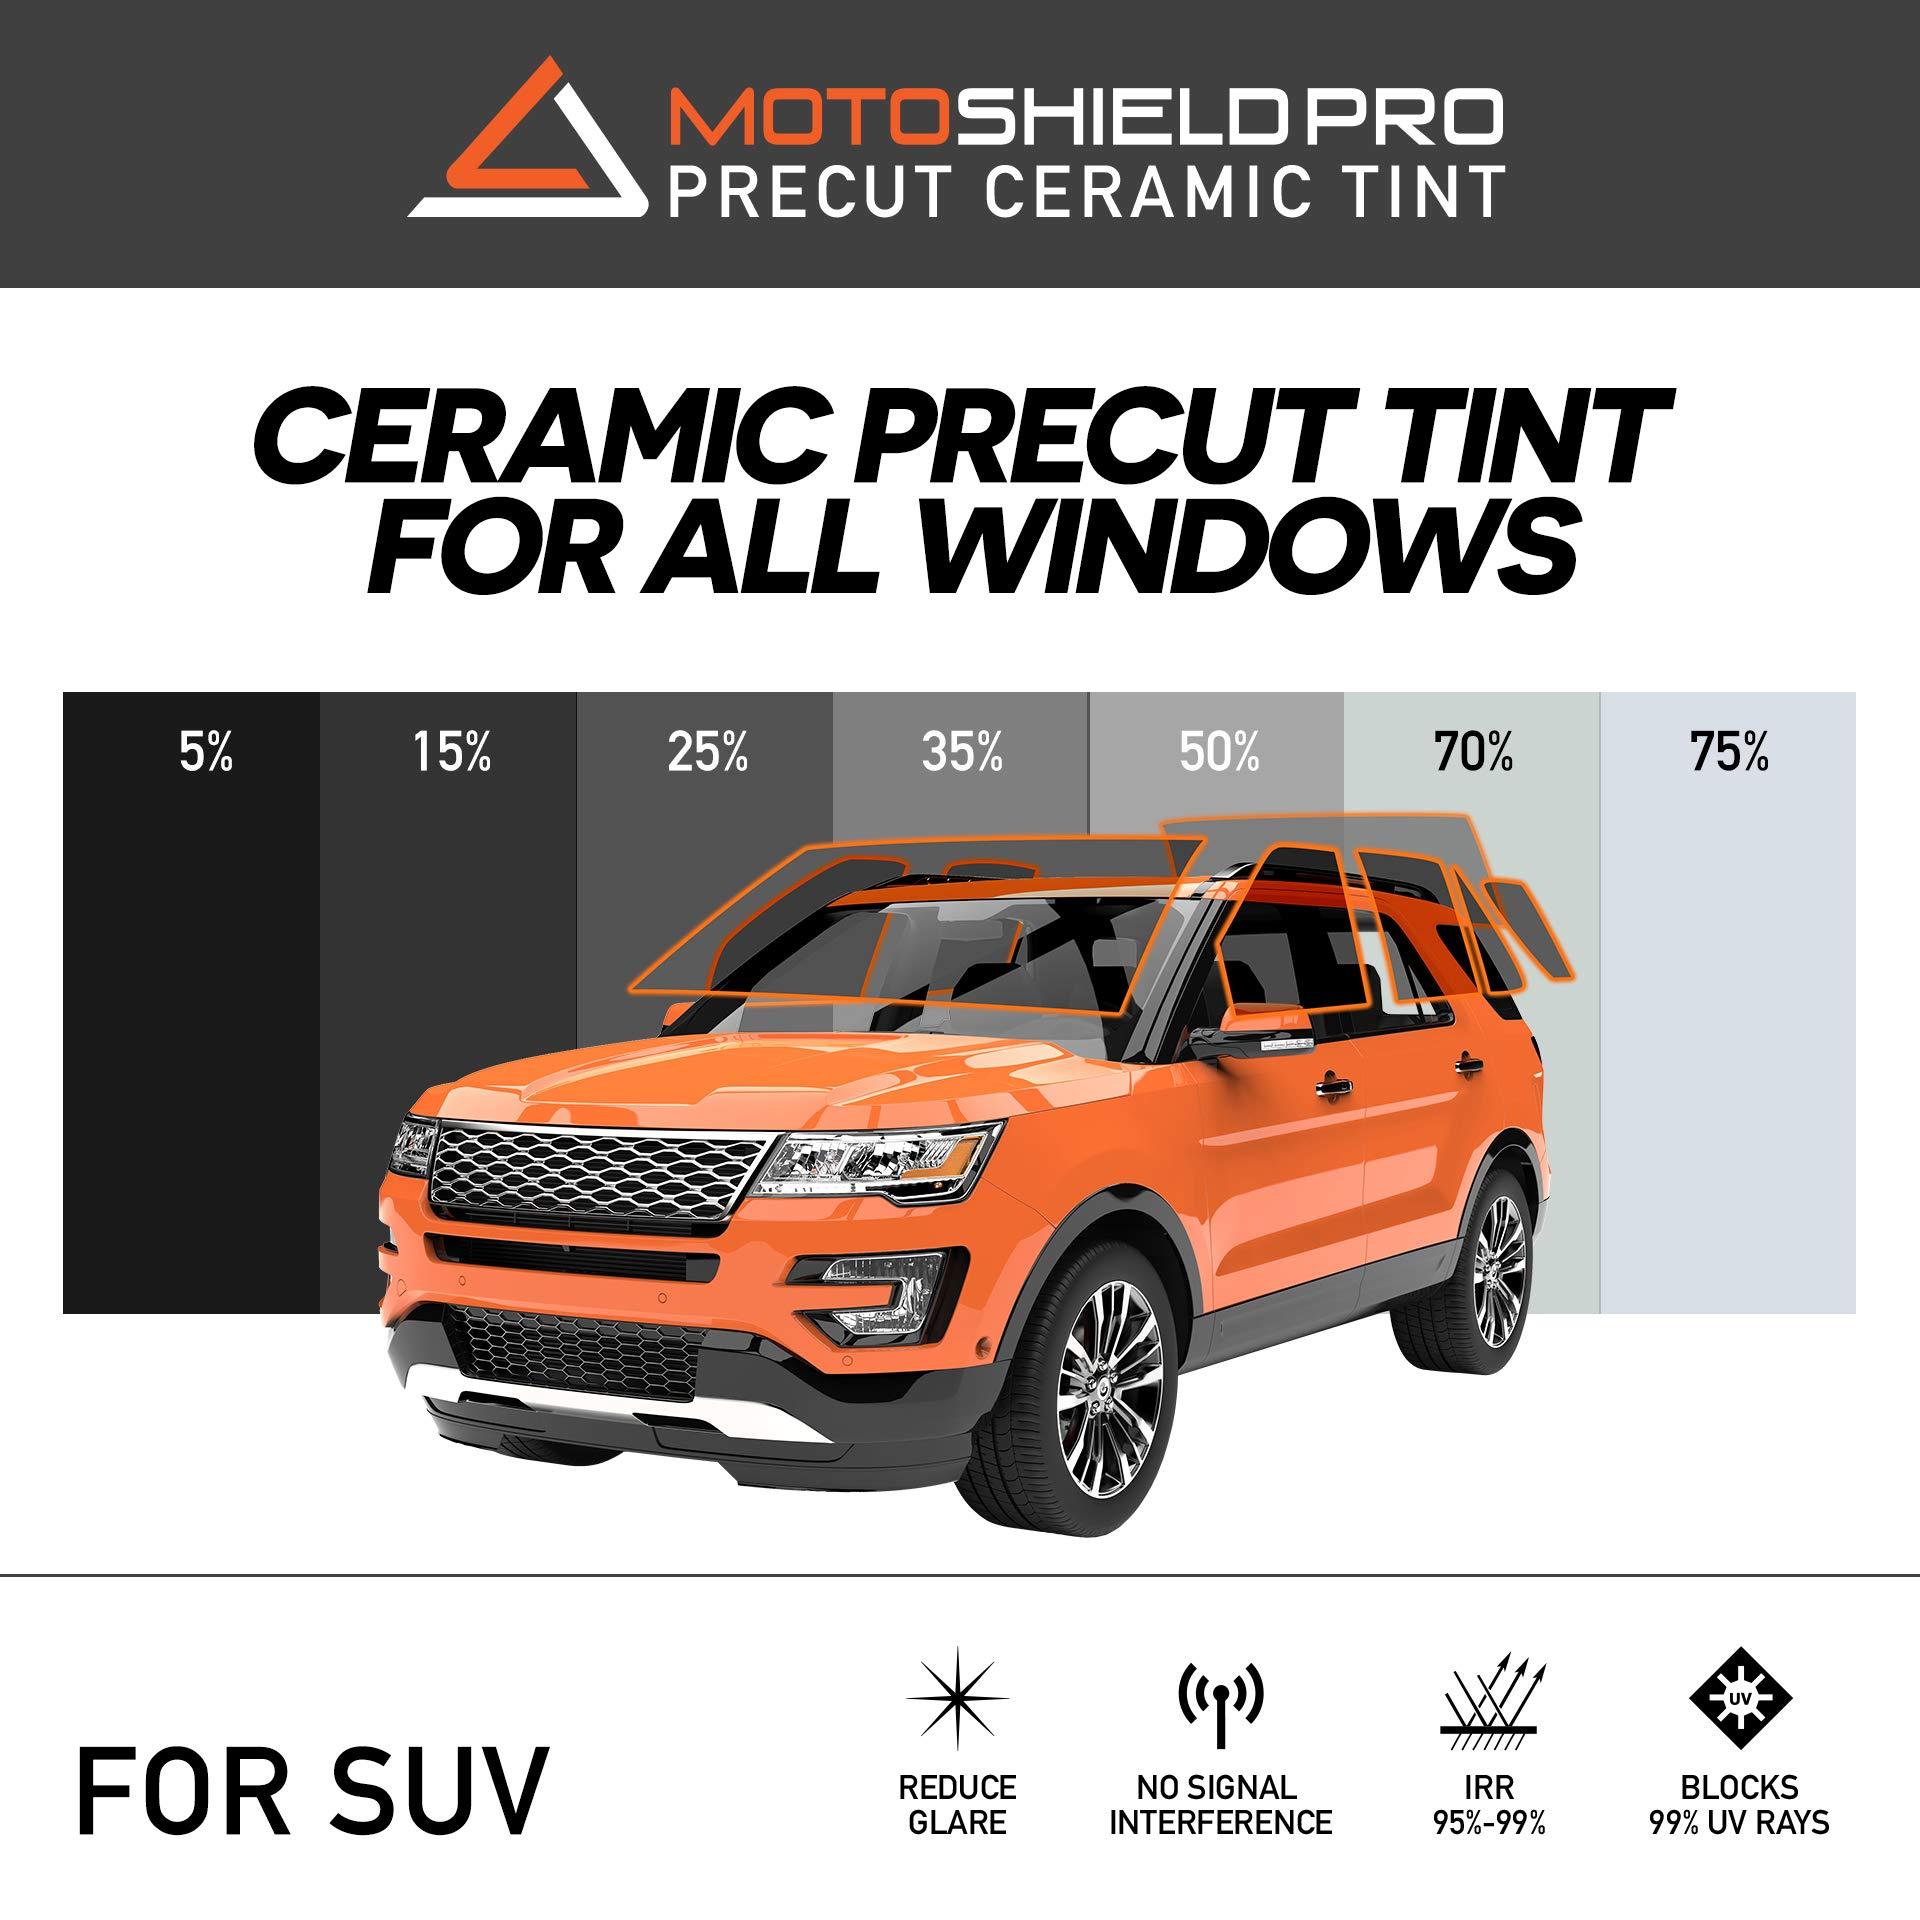 MotoShield Pro Precut Ceramic Tint Film [Blocks Up to 99% of UV/IRR Rays] Window Tint for SUVs - All Windows, Any Tint Shade by MotoShield Pro